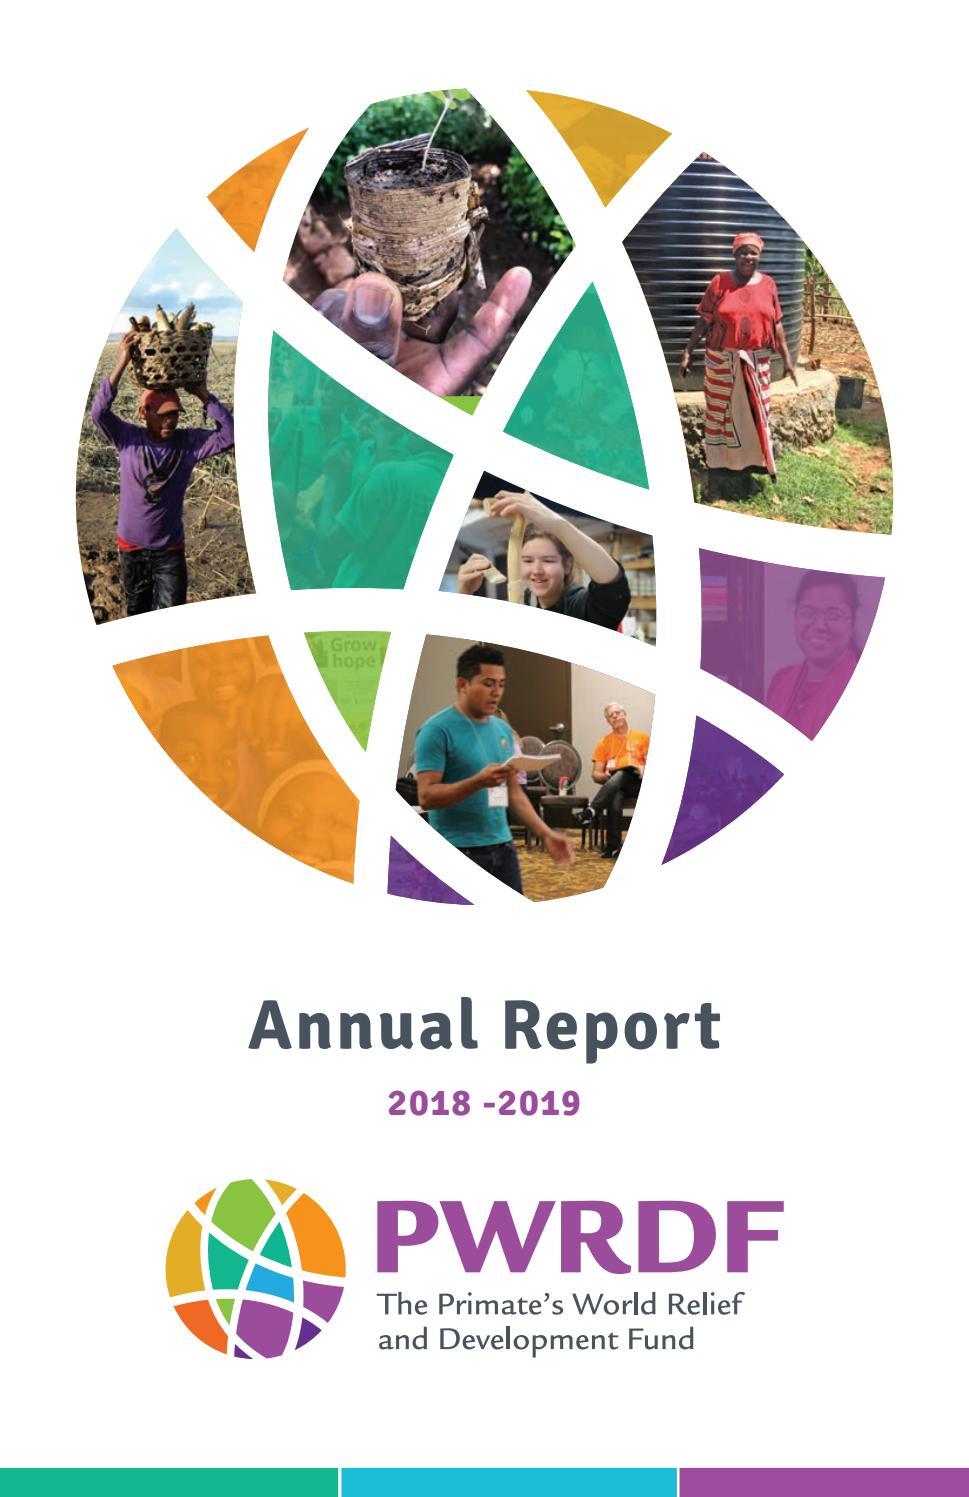 2019 Annual Report By Pwrdf1 Issuu